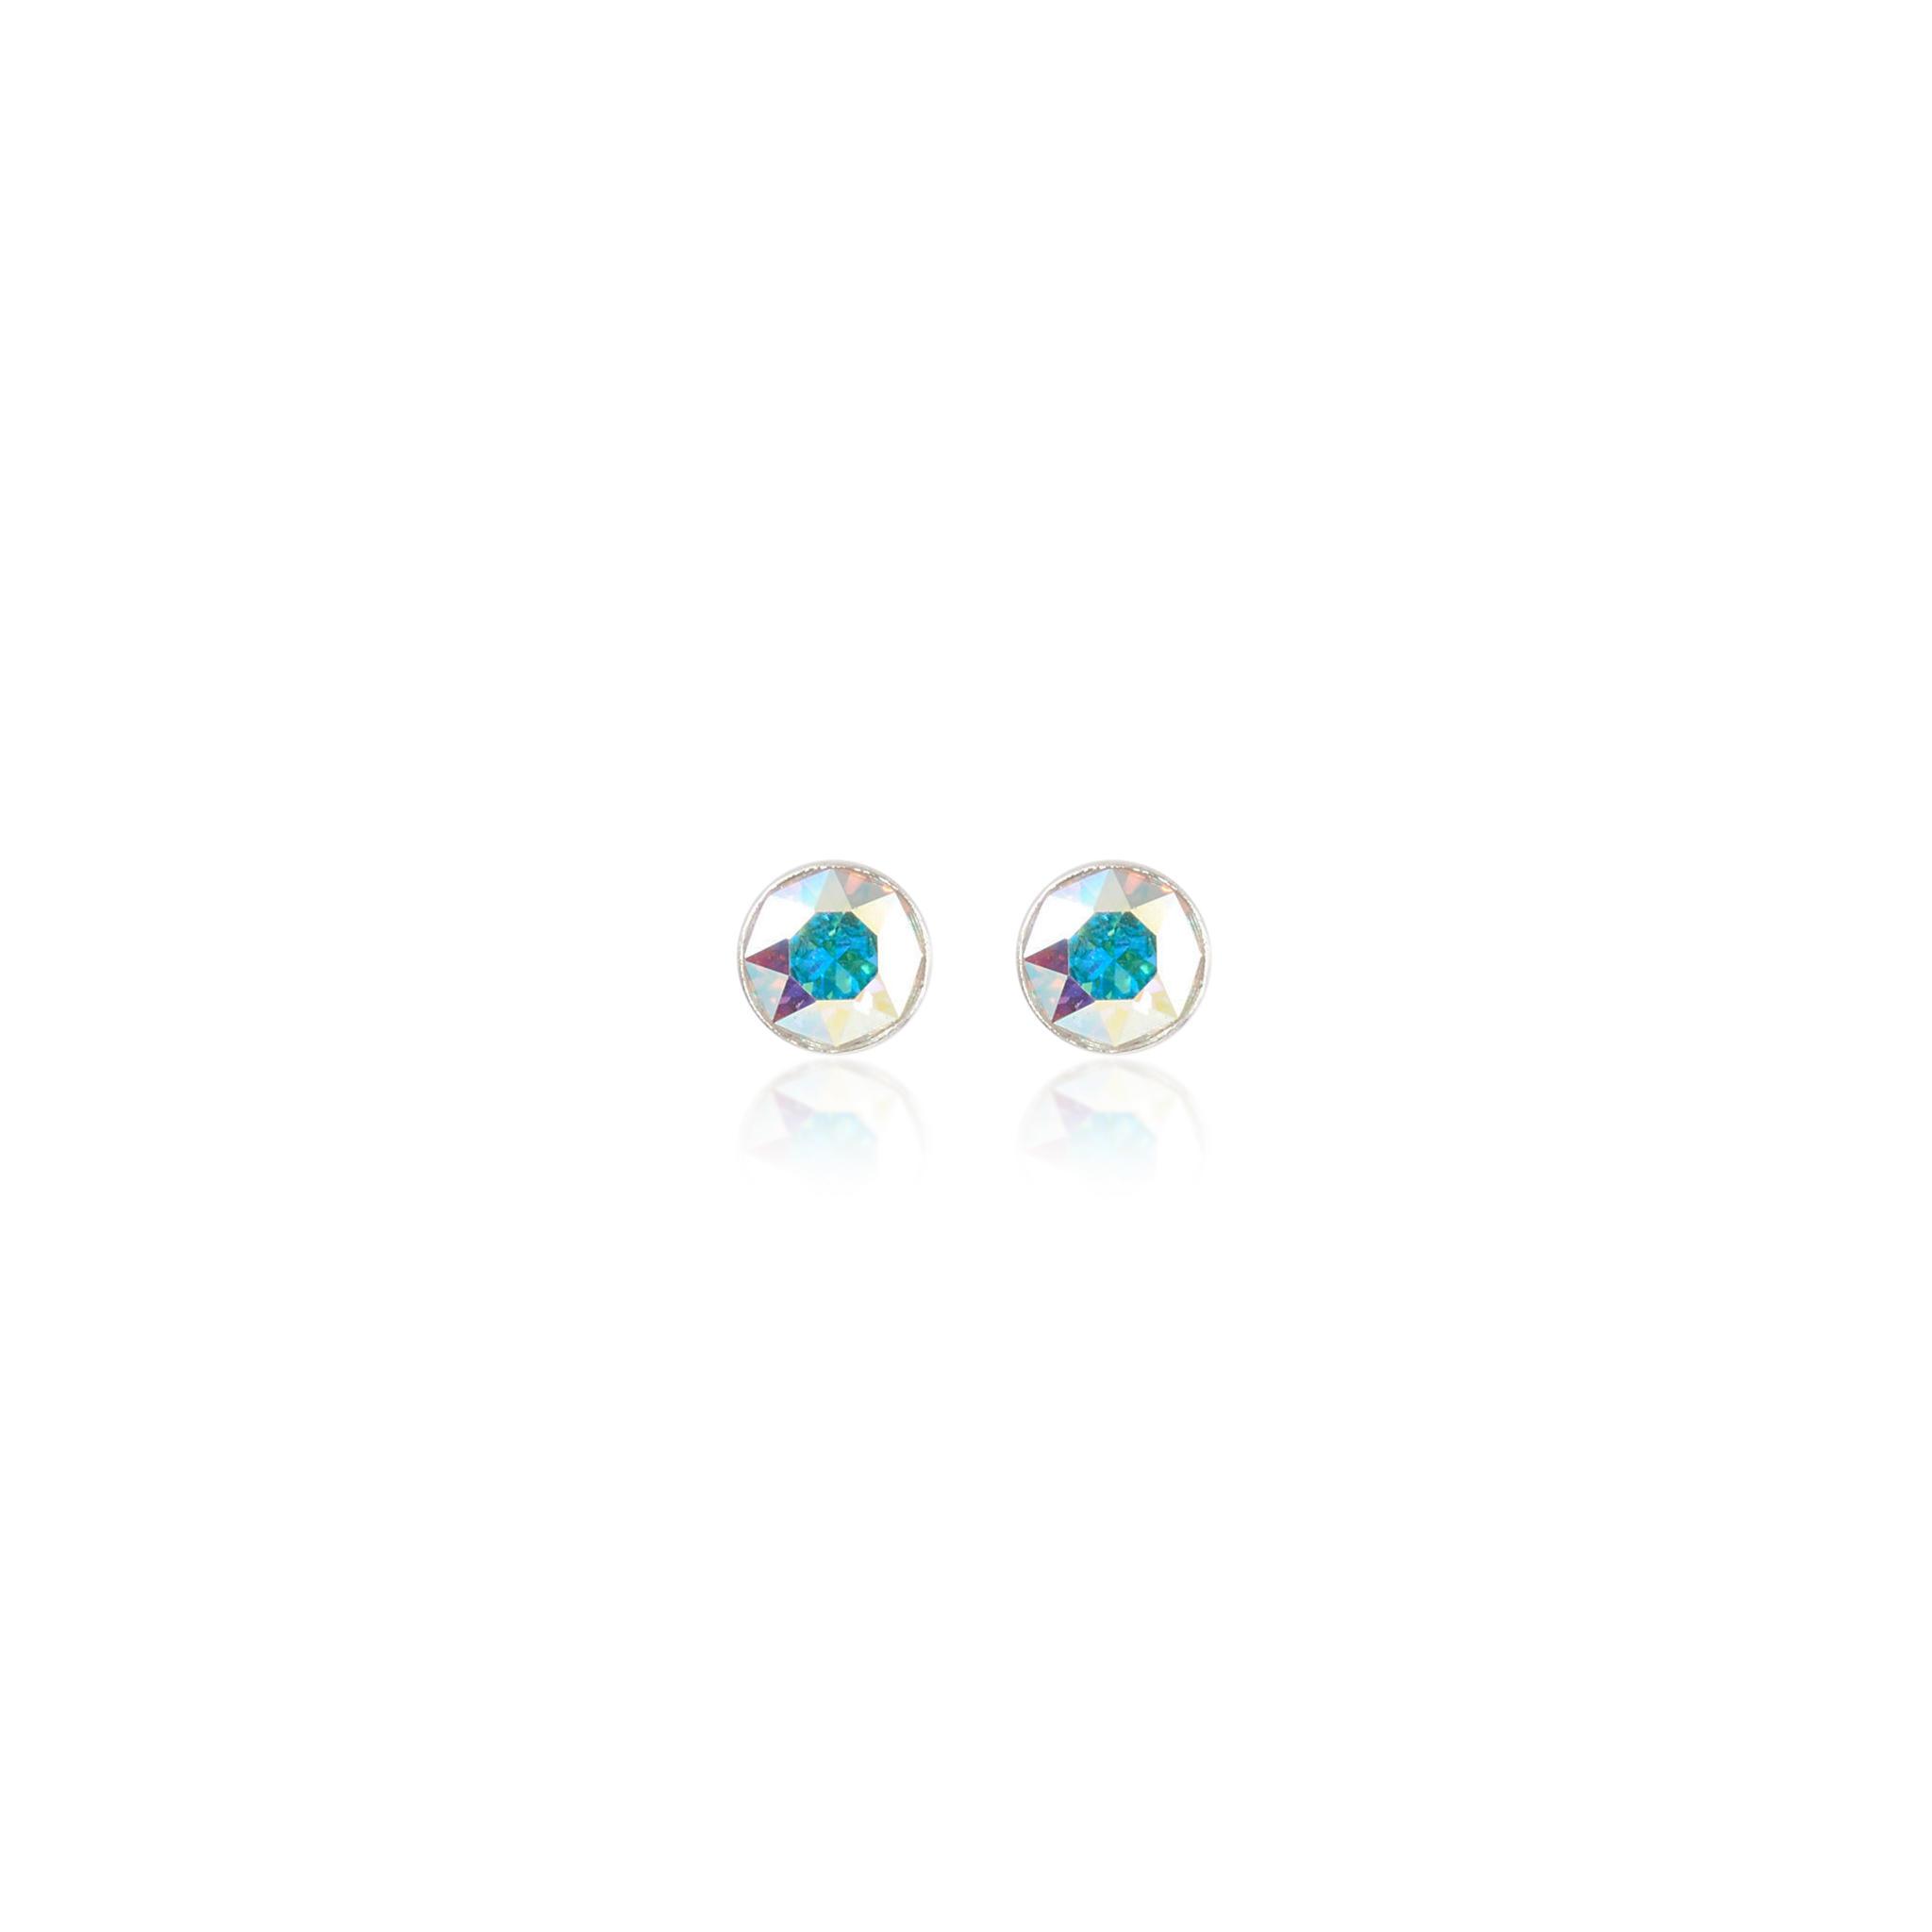 Eden Stud Earrings Aurora Borealis